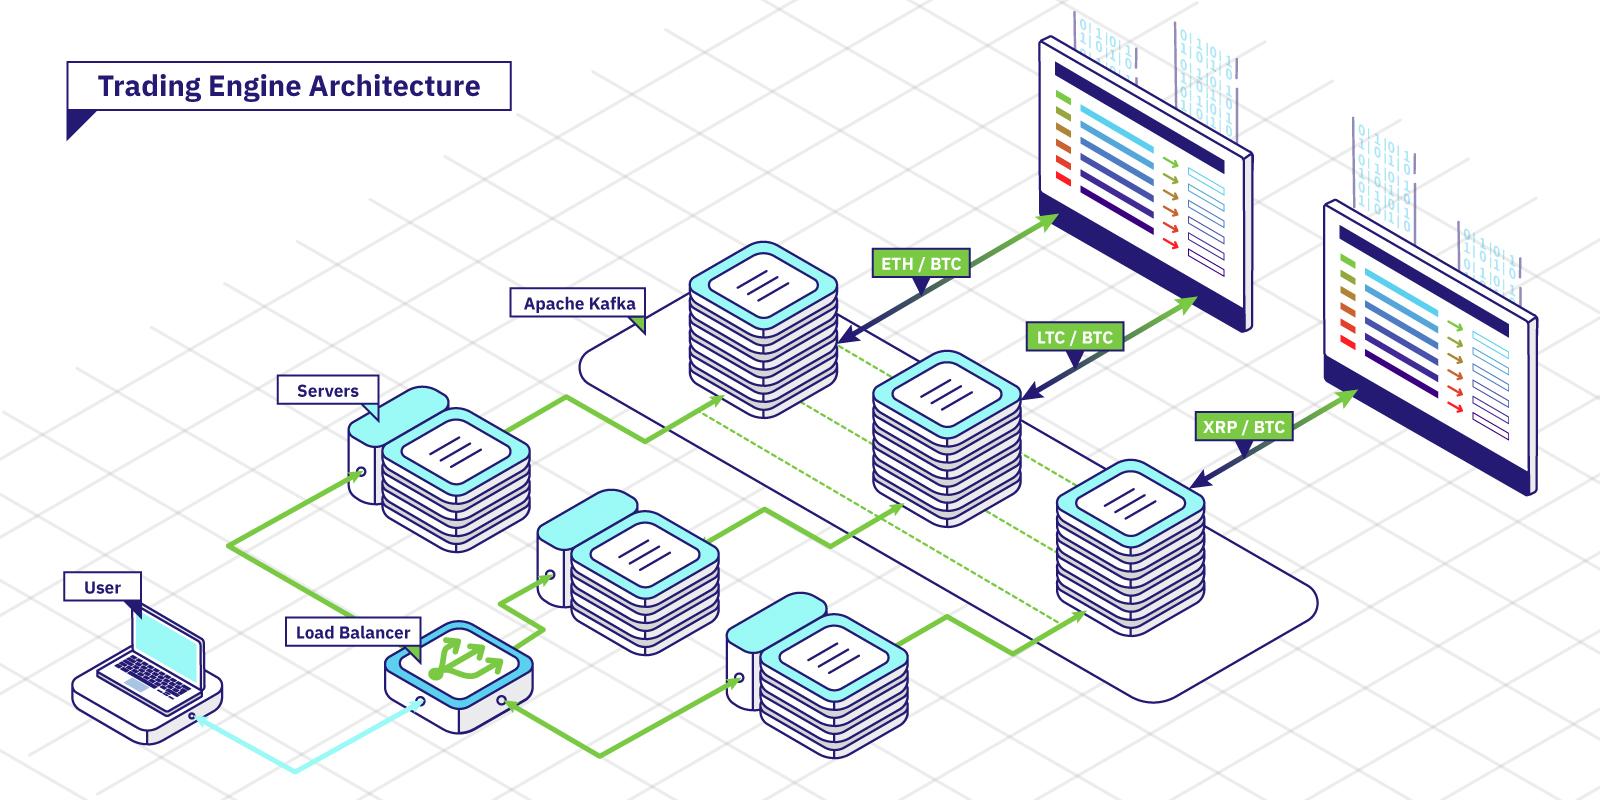 Trading-engine-architecture